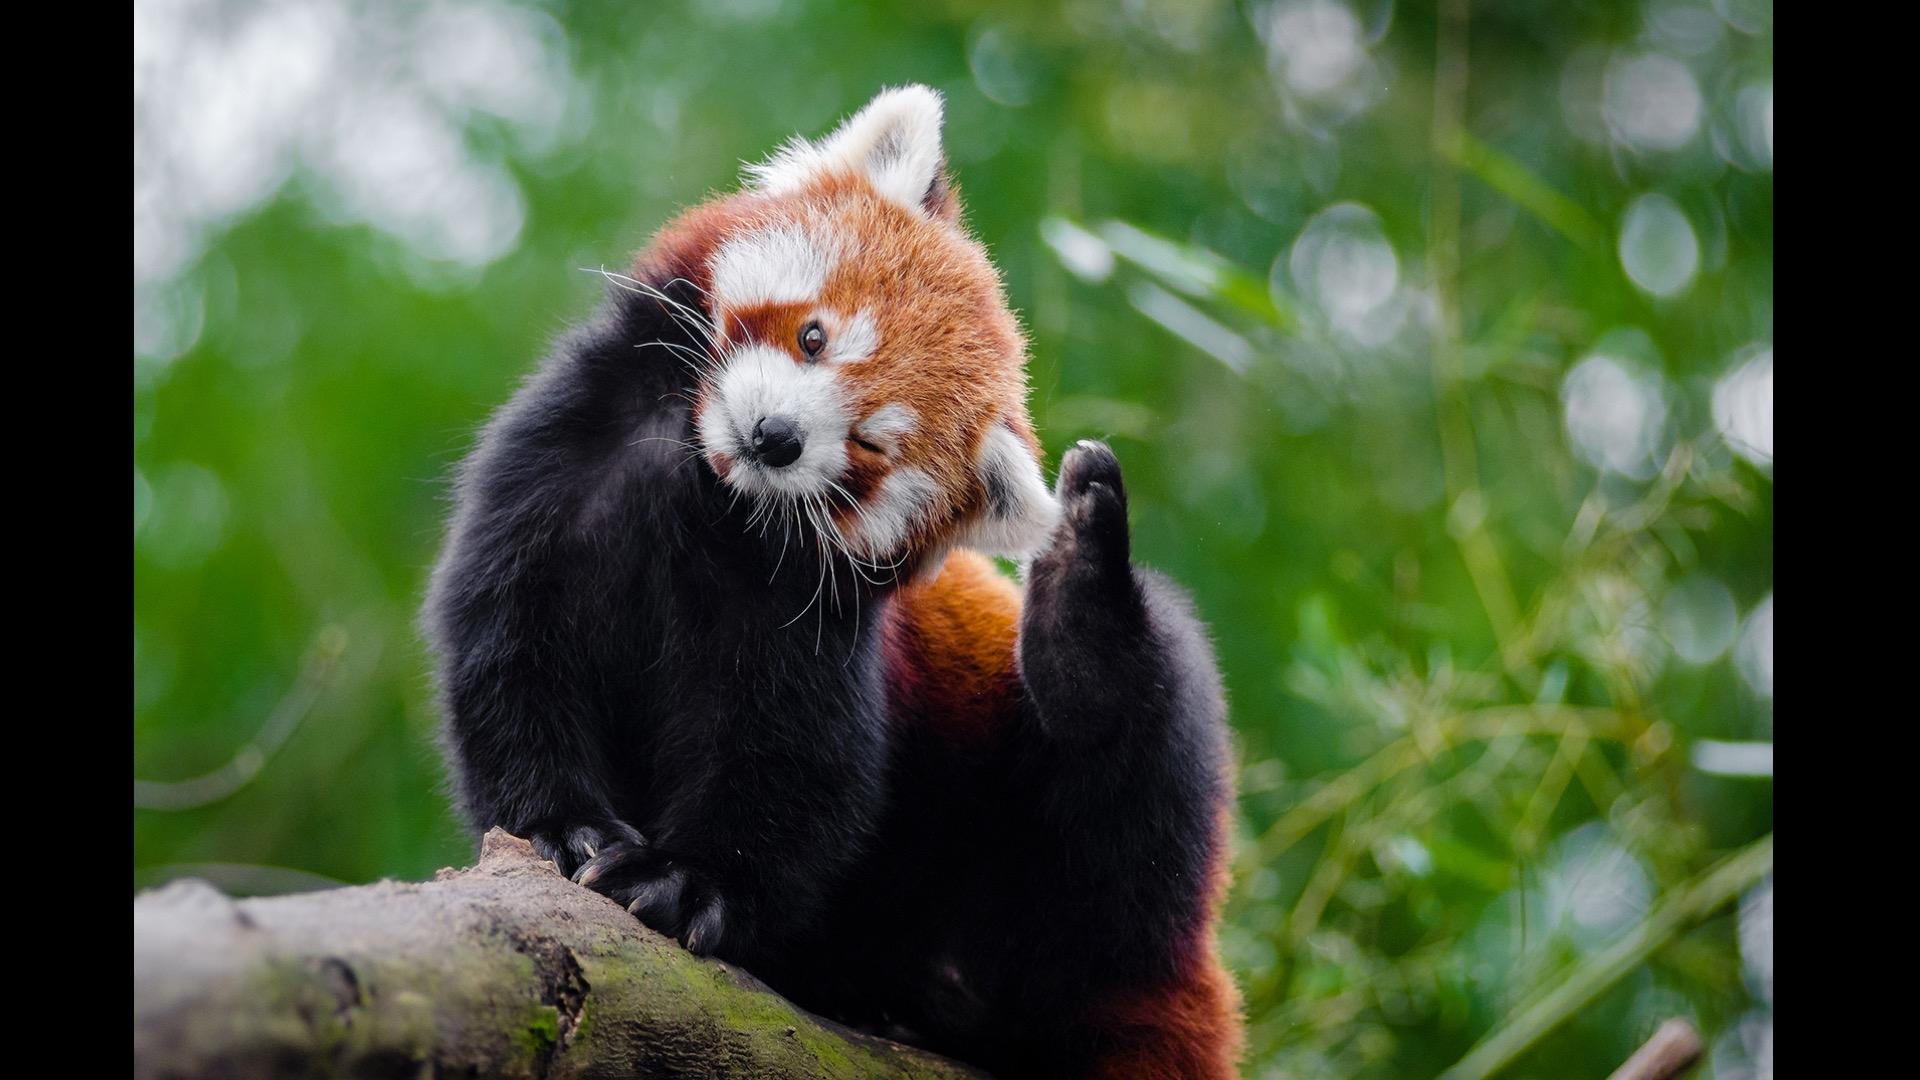 fire fox scratching its ear